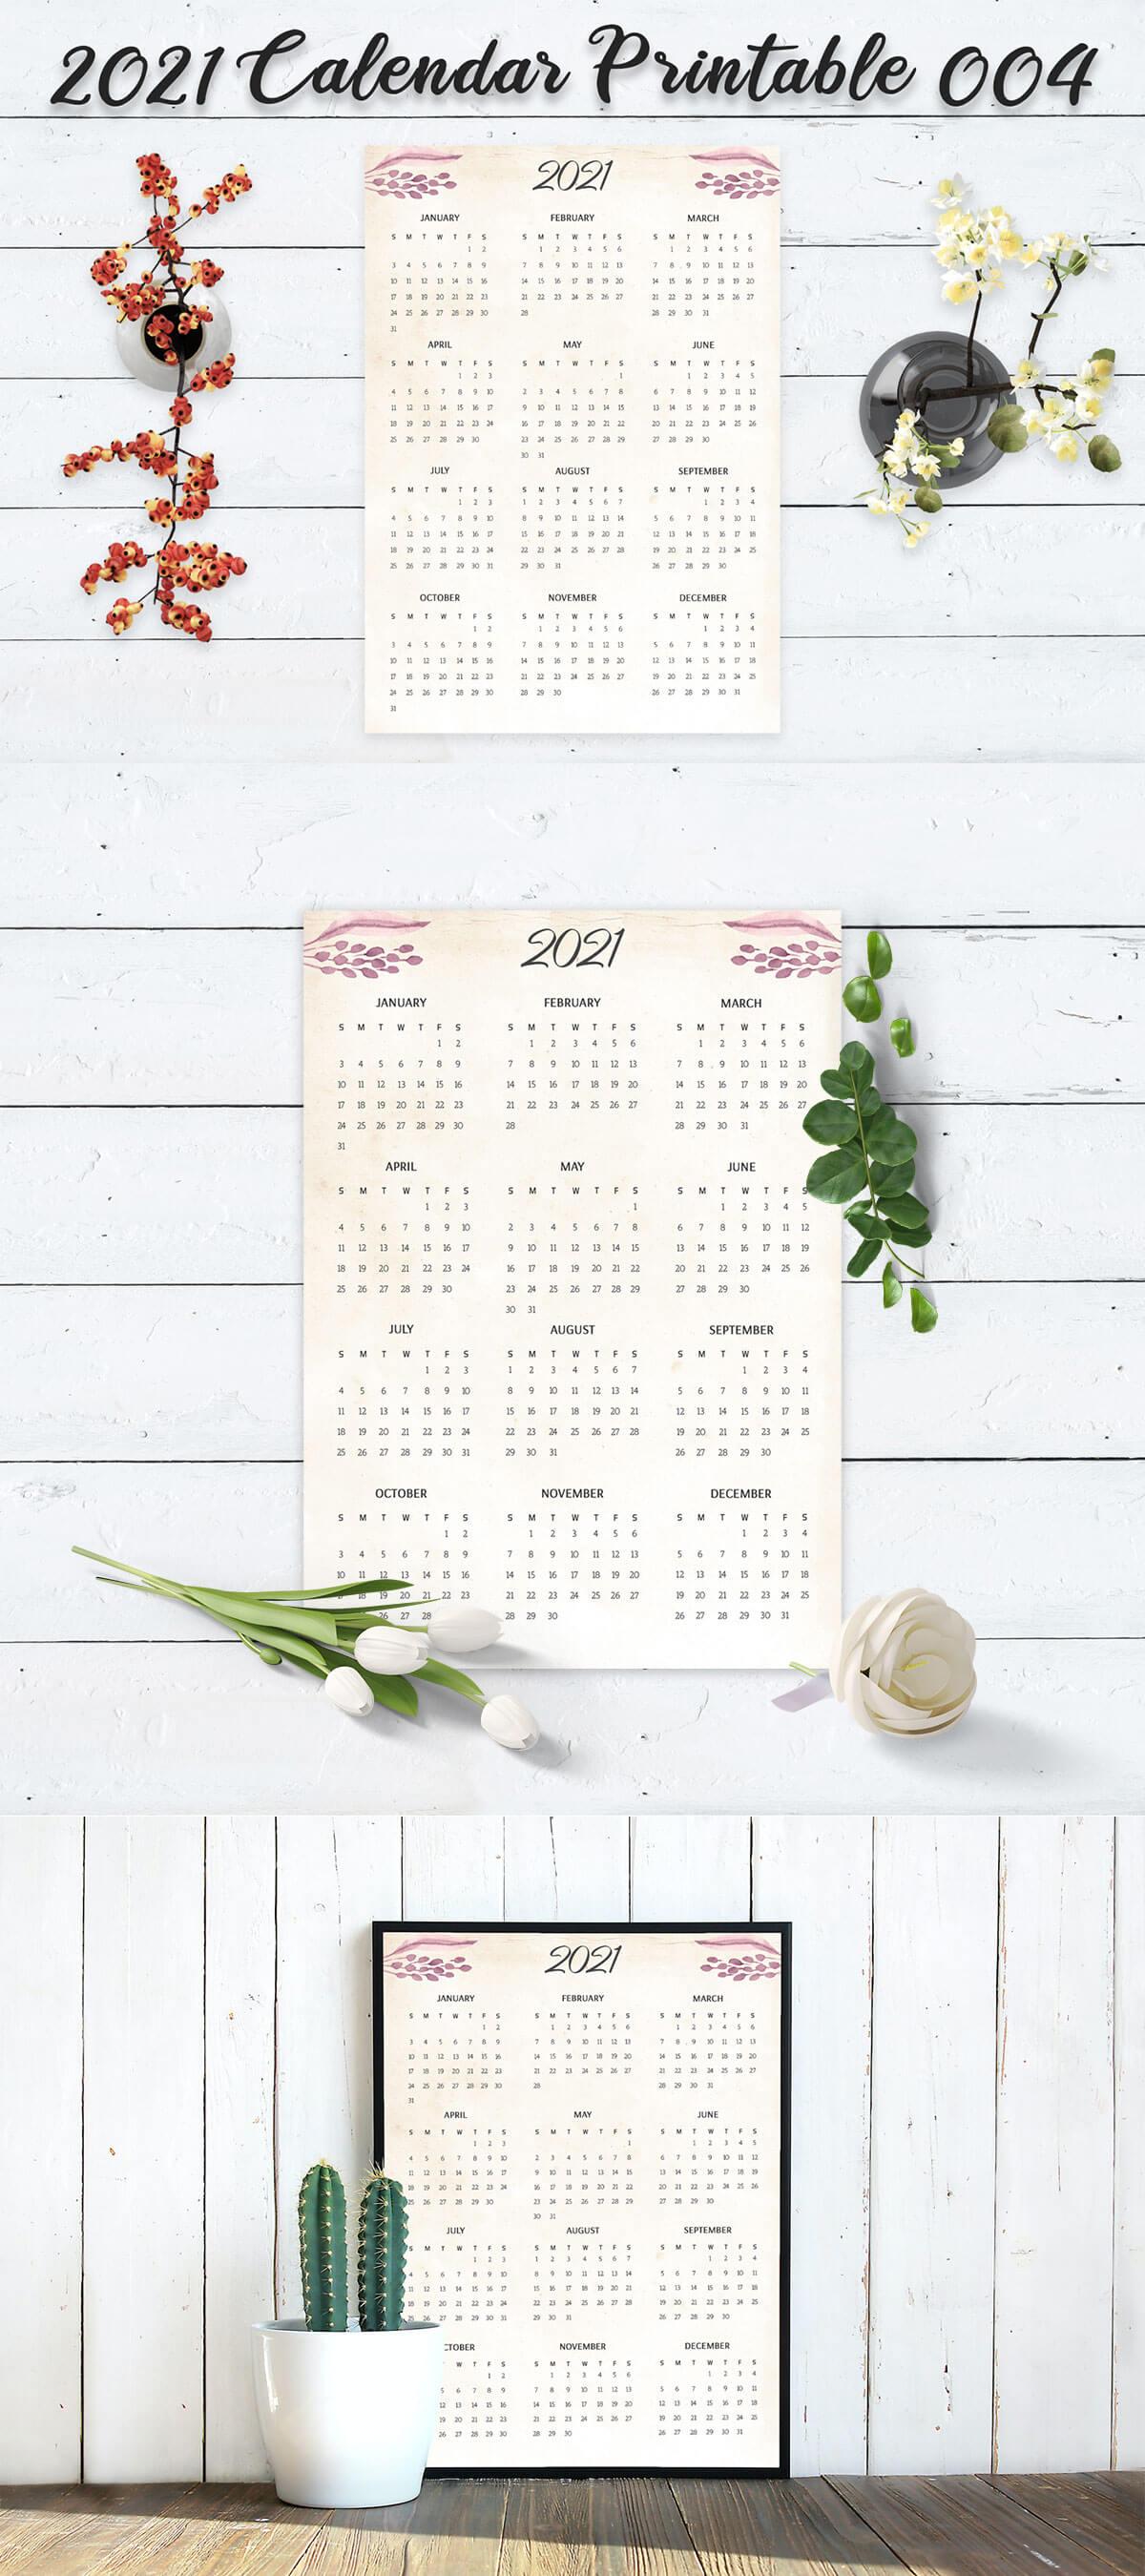 Free Calendar 2021 Printable 004